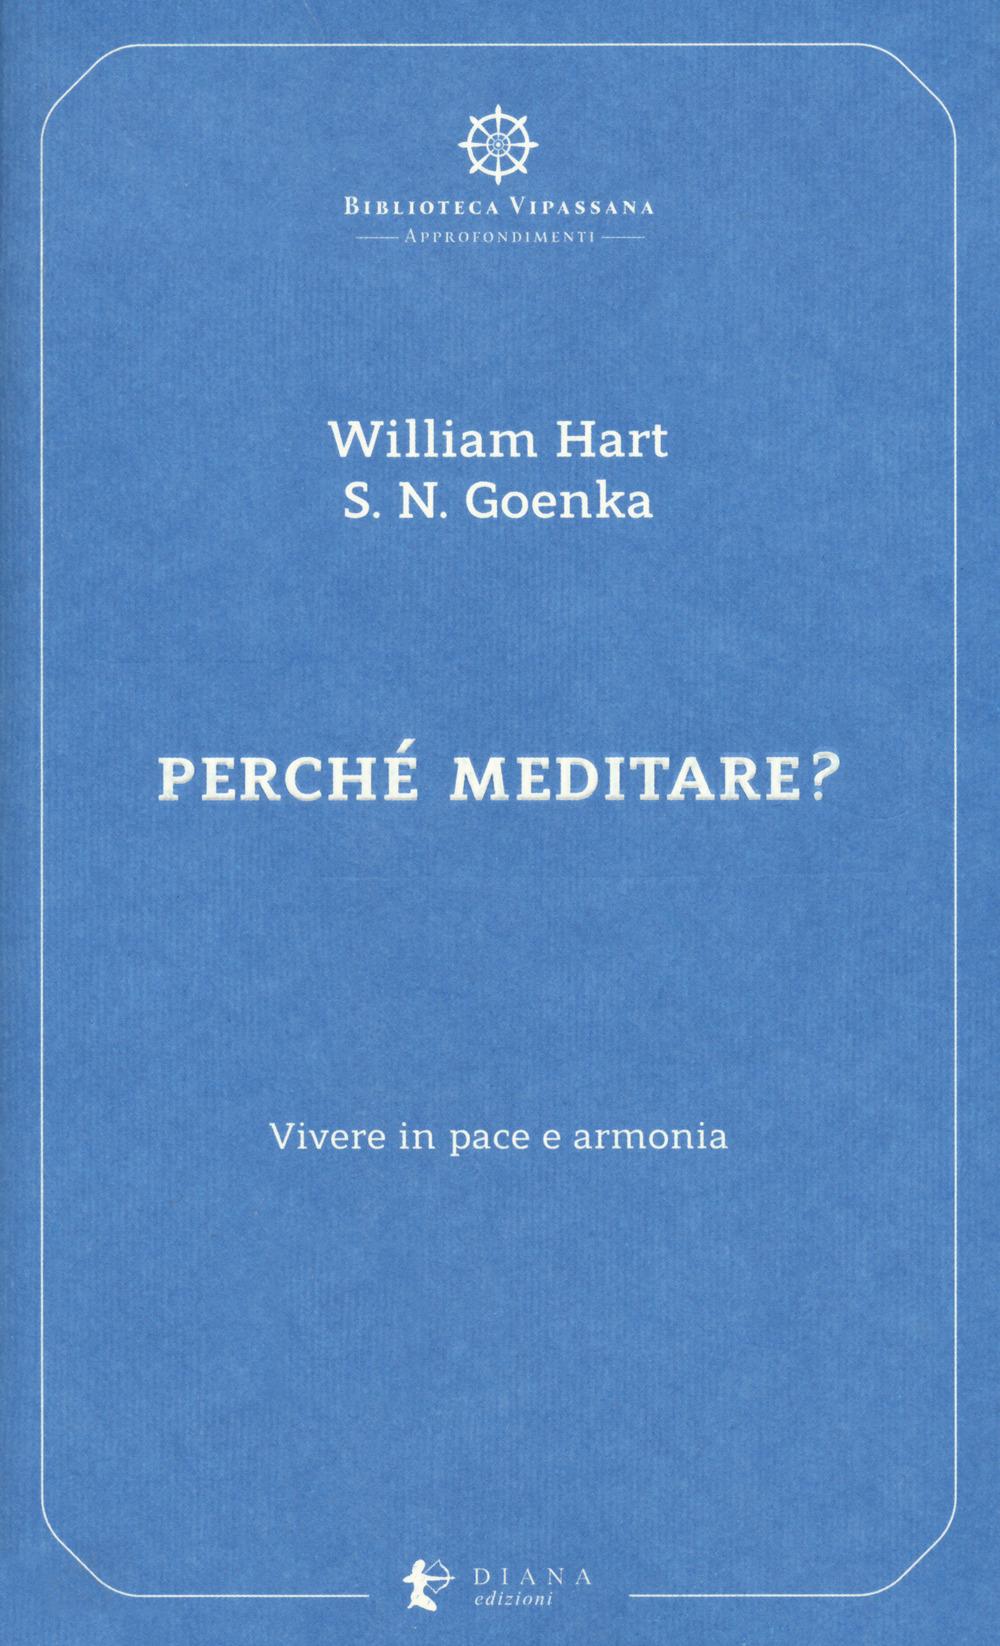 PERCHÉ MEDITARE? VIVERE IN PACE E ARMONIA - Hart William; Goenka Satya Narayan; Confalonieri P. (cur.) - 9788896221488